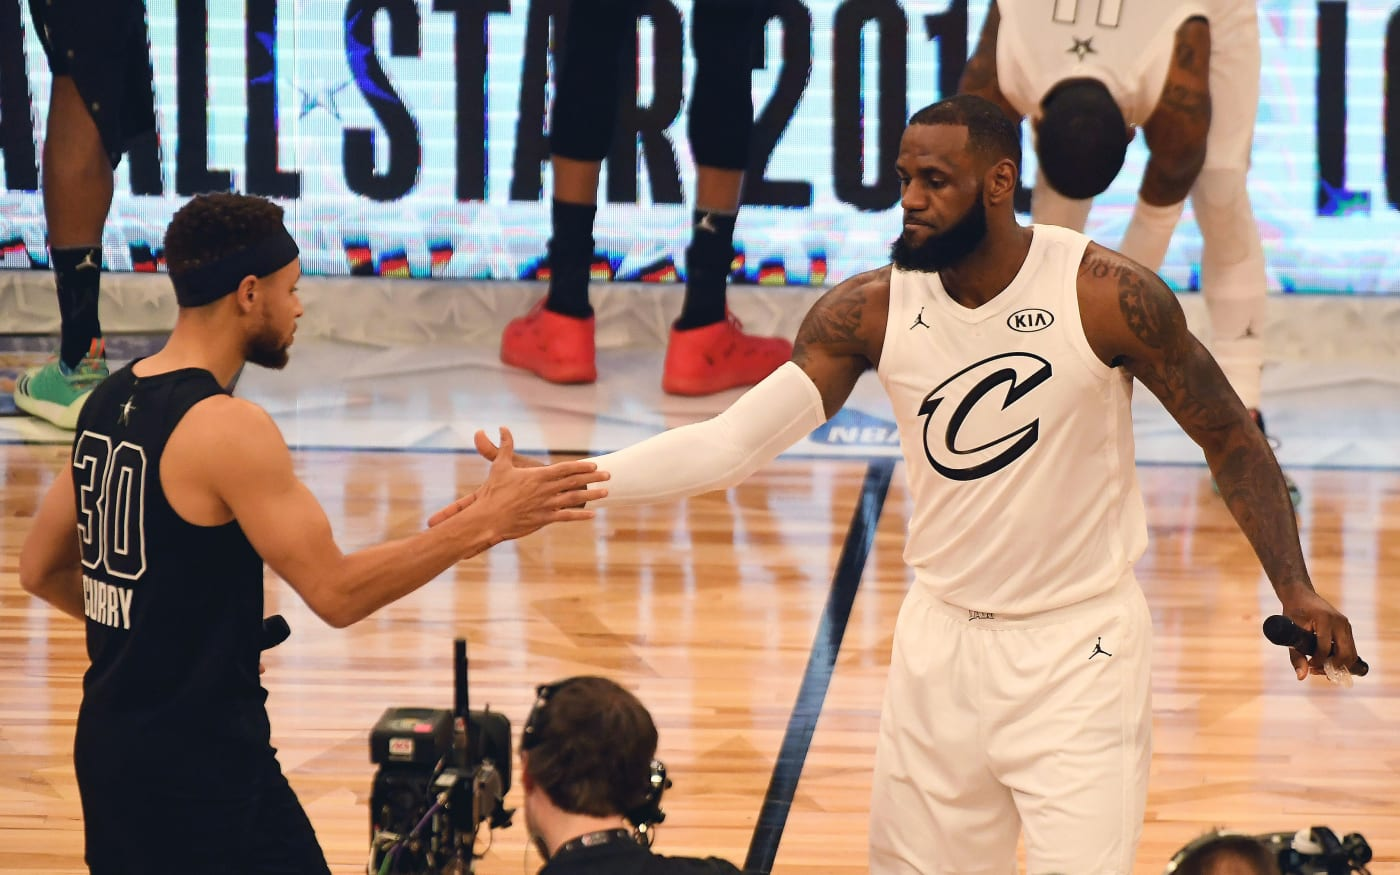 LeBron Steph NBA All Star Game 2018 Tip